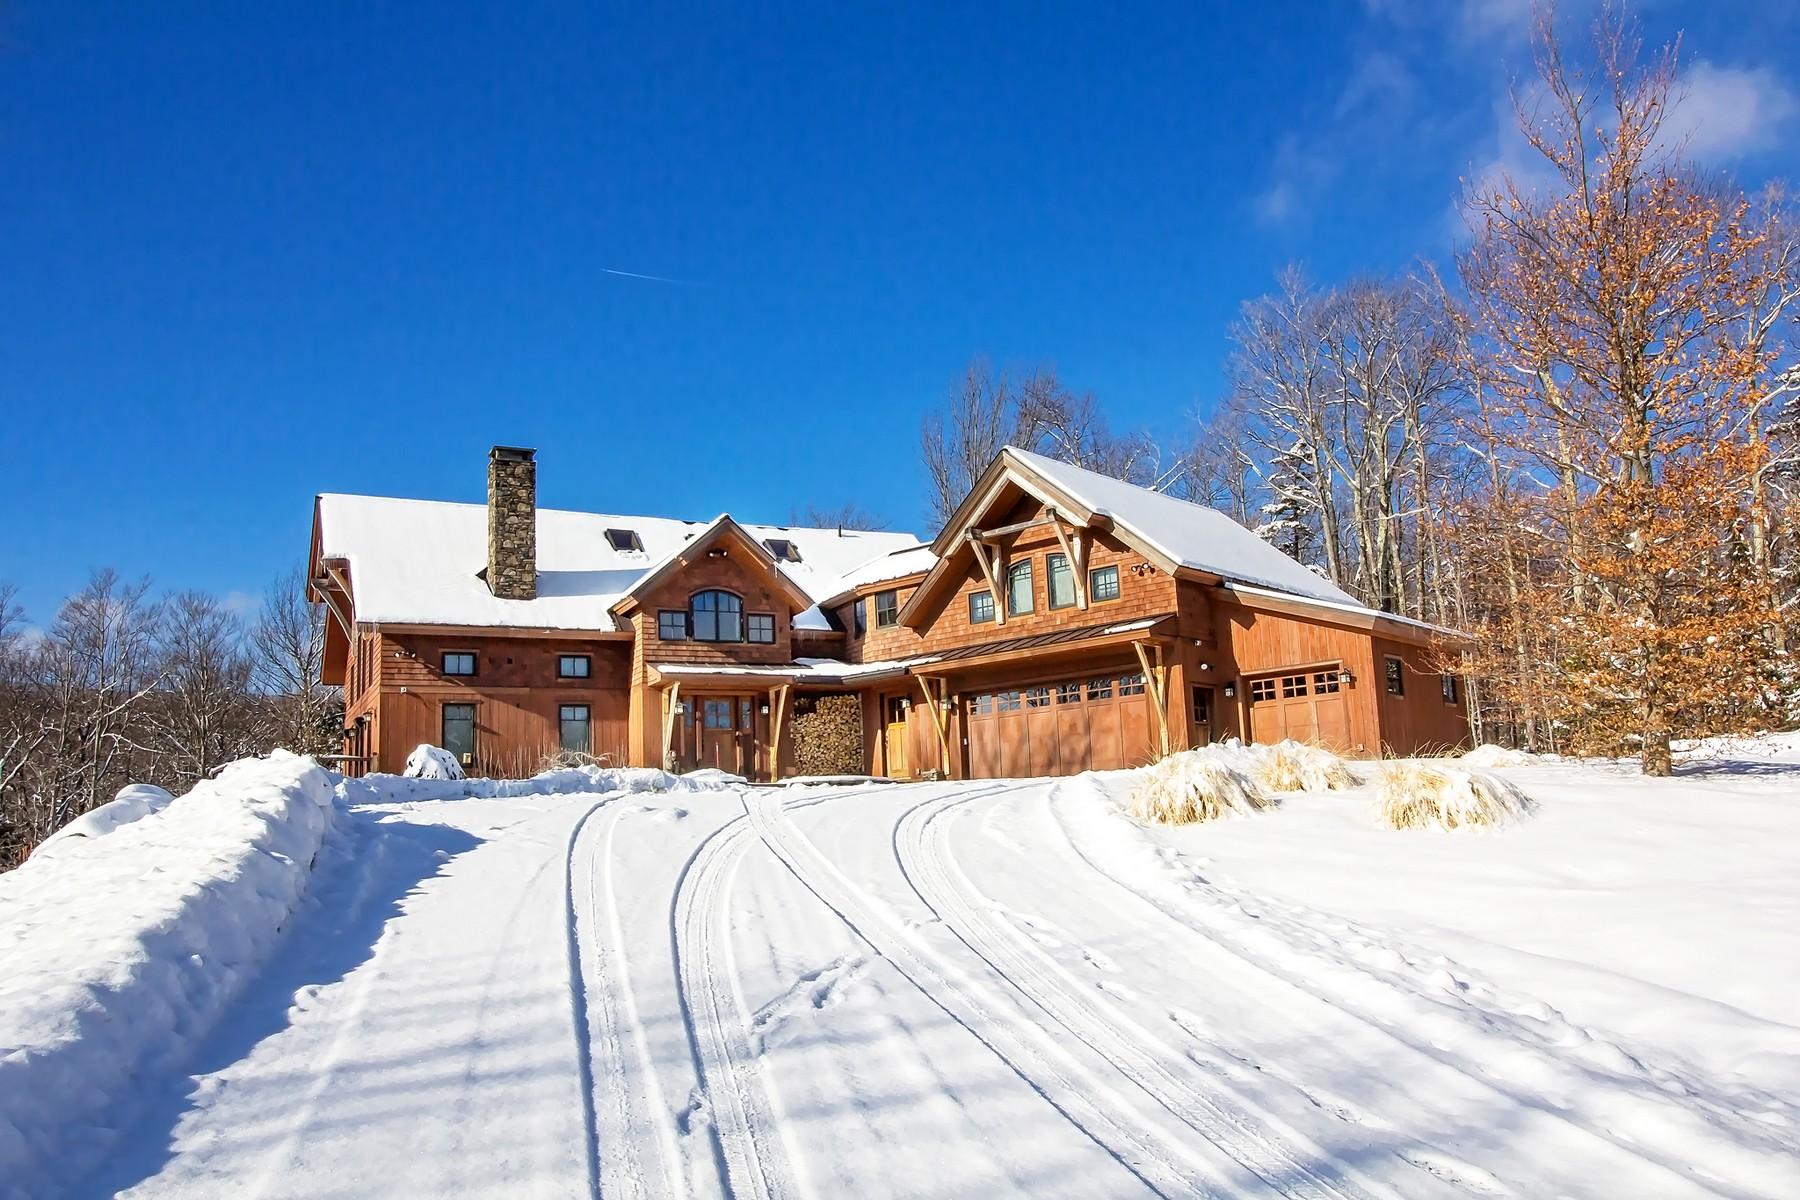 独户住宅 为 销售 在 Spectactular Location, Views and Home 133 Handle Rd, 多佛, 佛蒙特州, 05356 美国